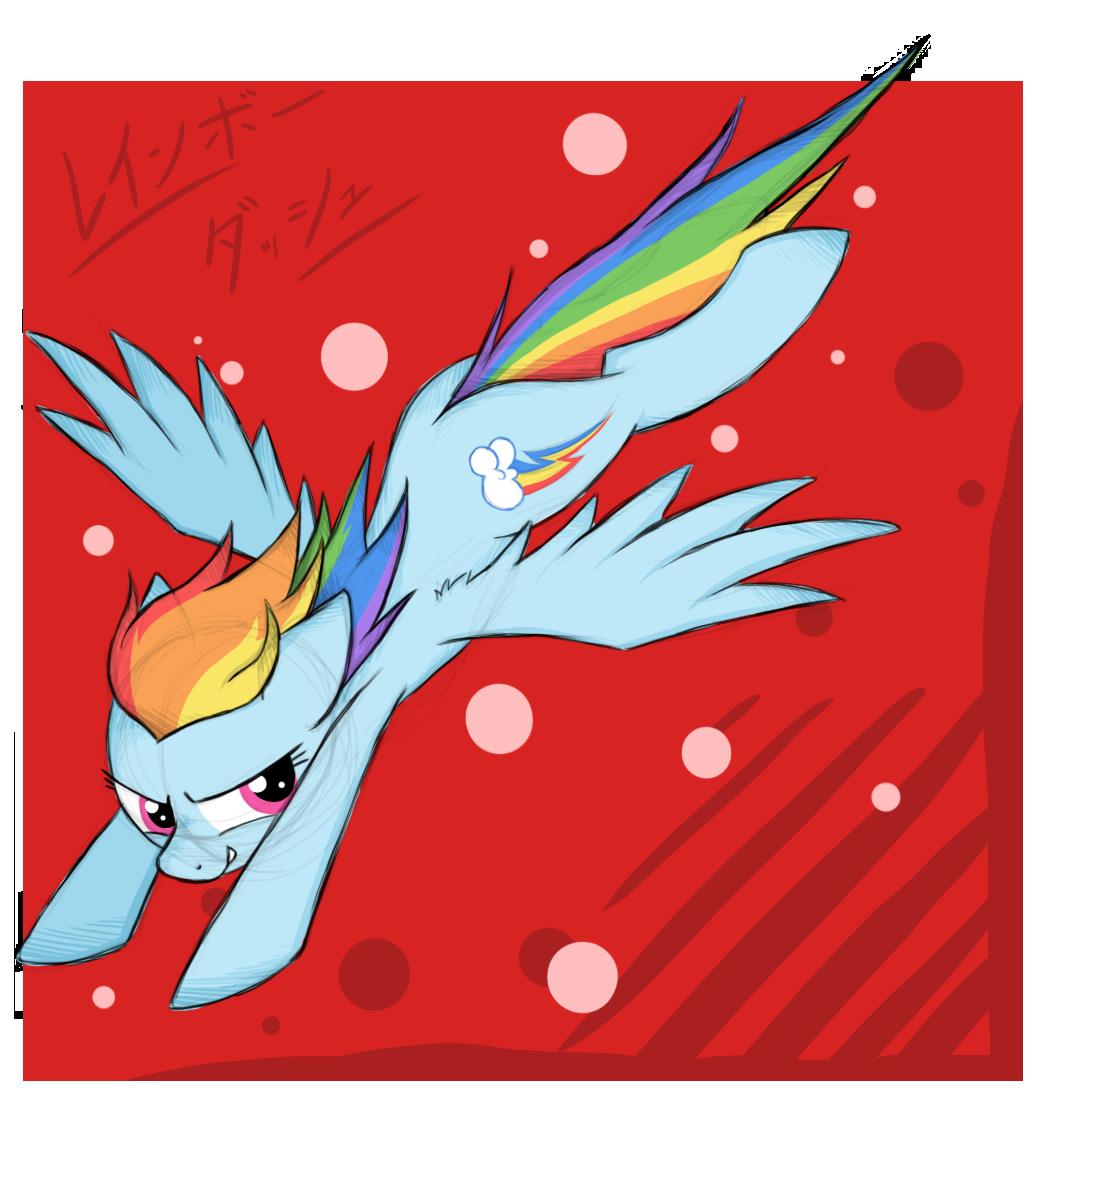 Sketchy Rainbow Dash -Japanese- by Natsu714